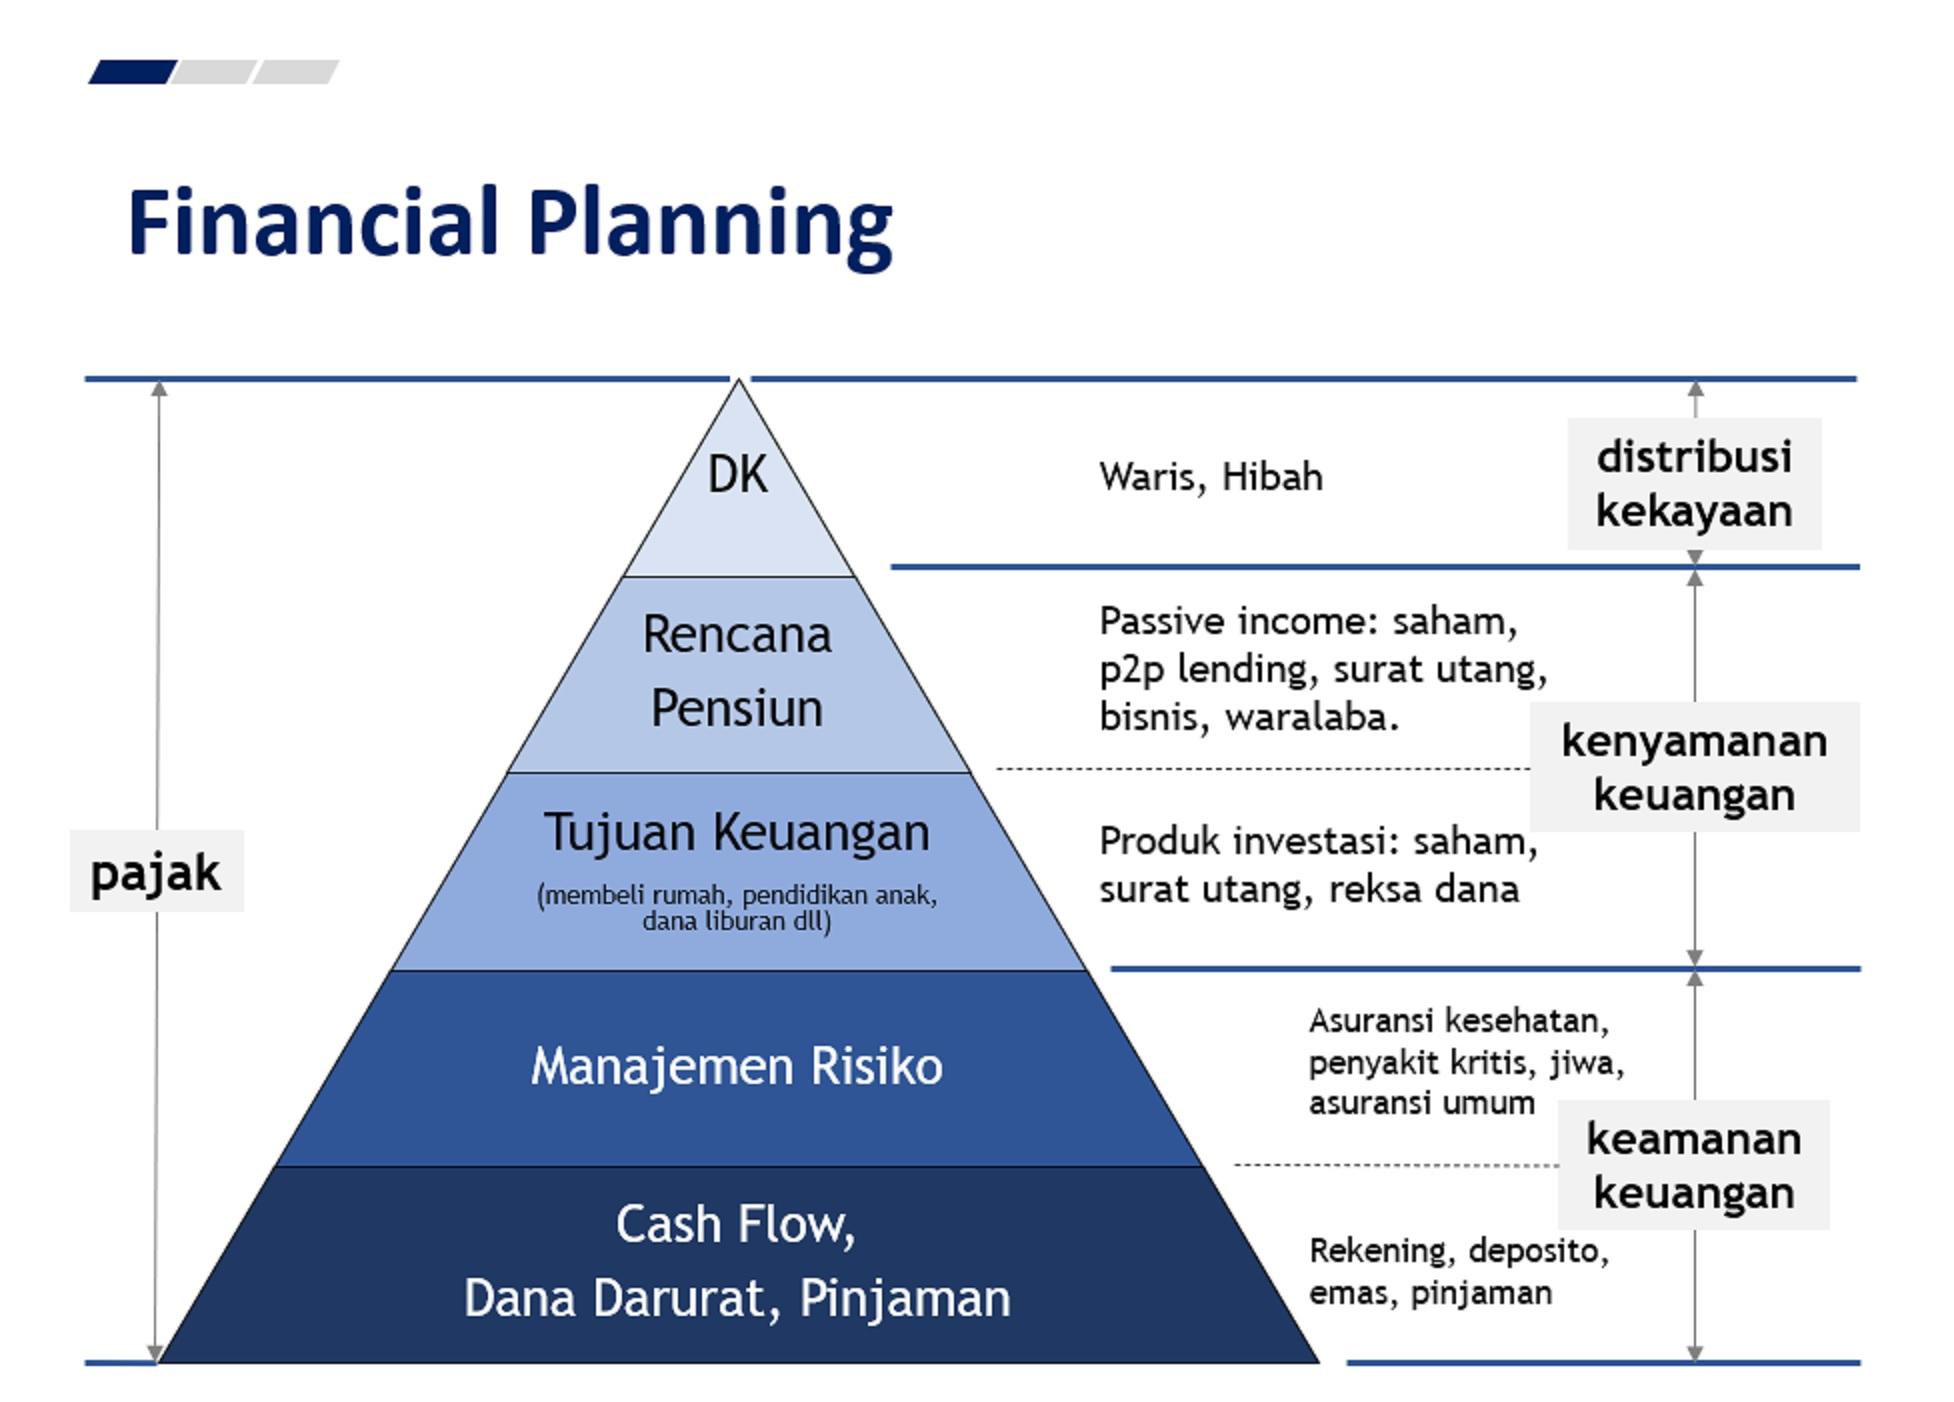 Piramida financial planning | Foto: Materi Finansialku.com